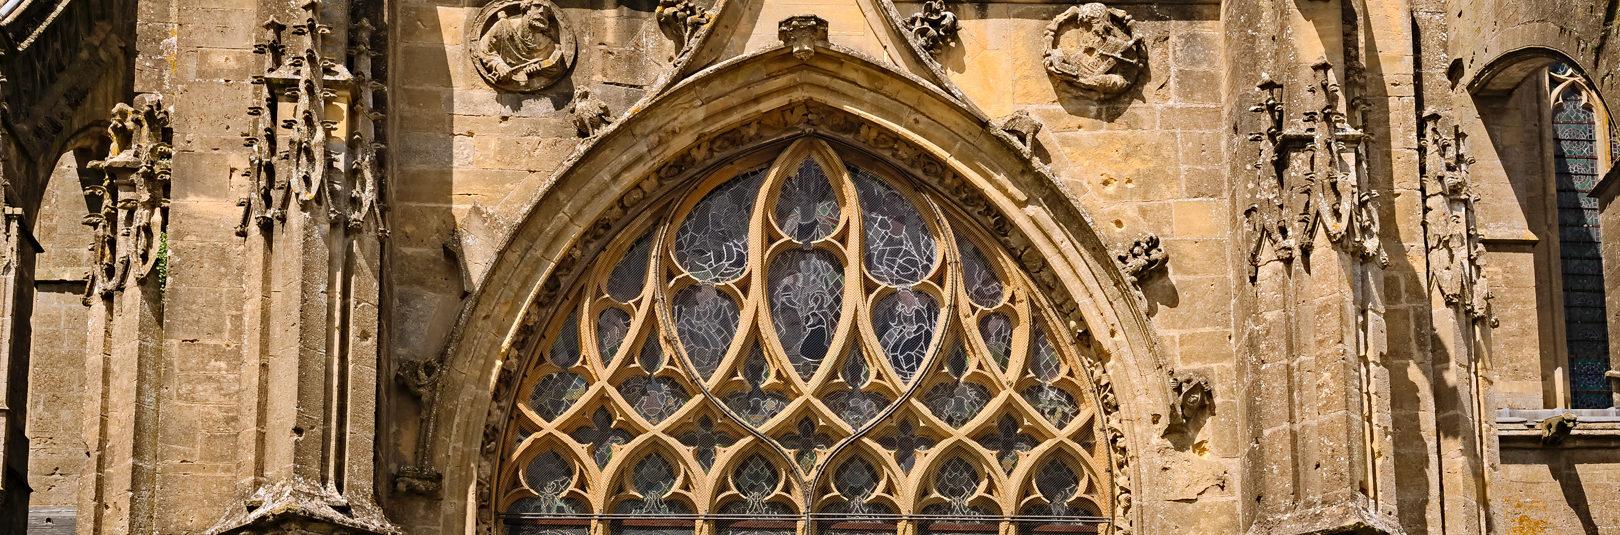 Notre-Dame d'Avioth